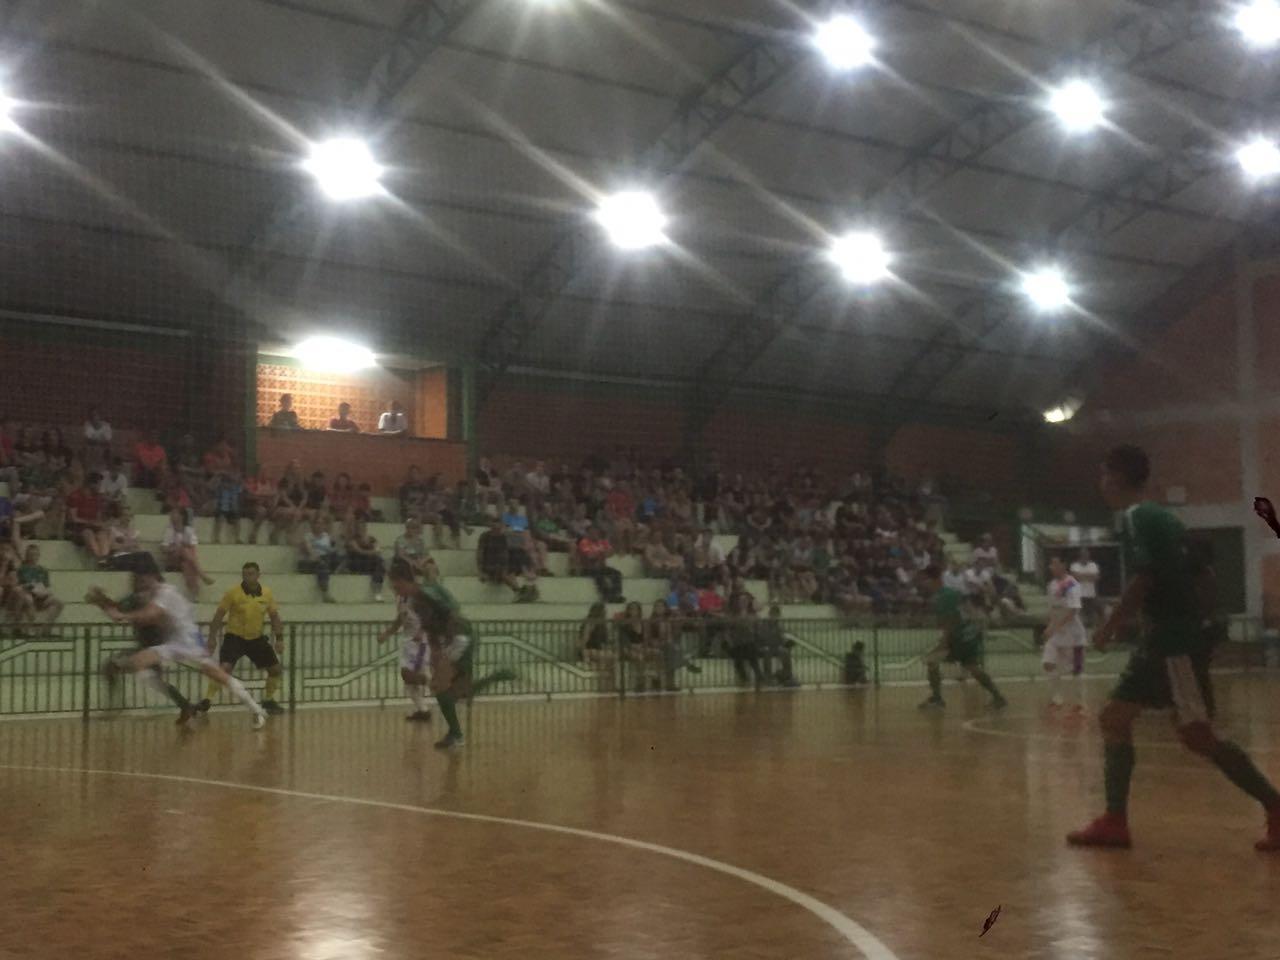 Sub-17 do Joni Gool estreia com goleada no Campeonato Catarinense